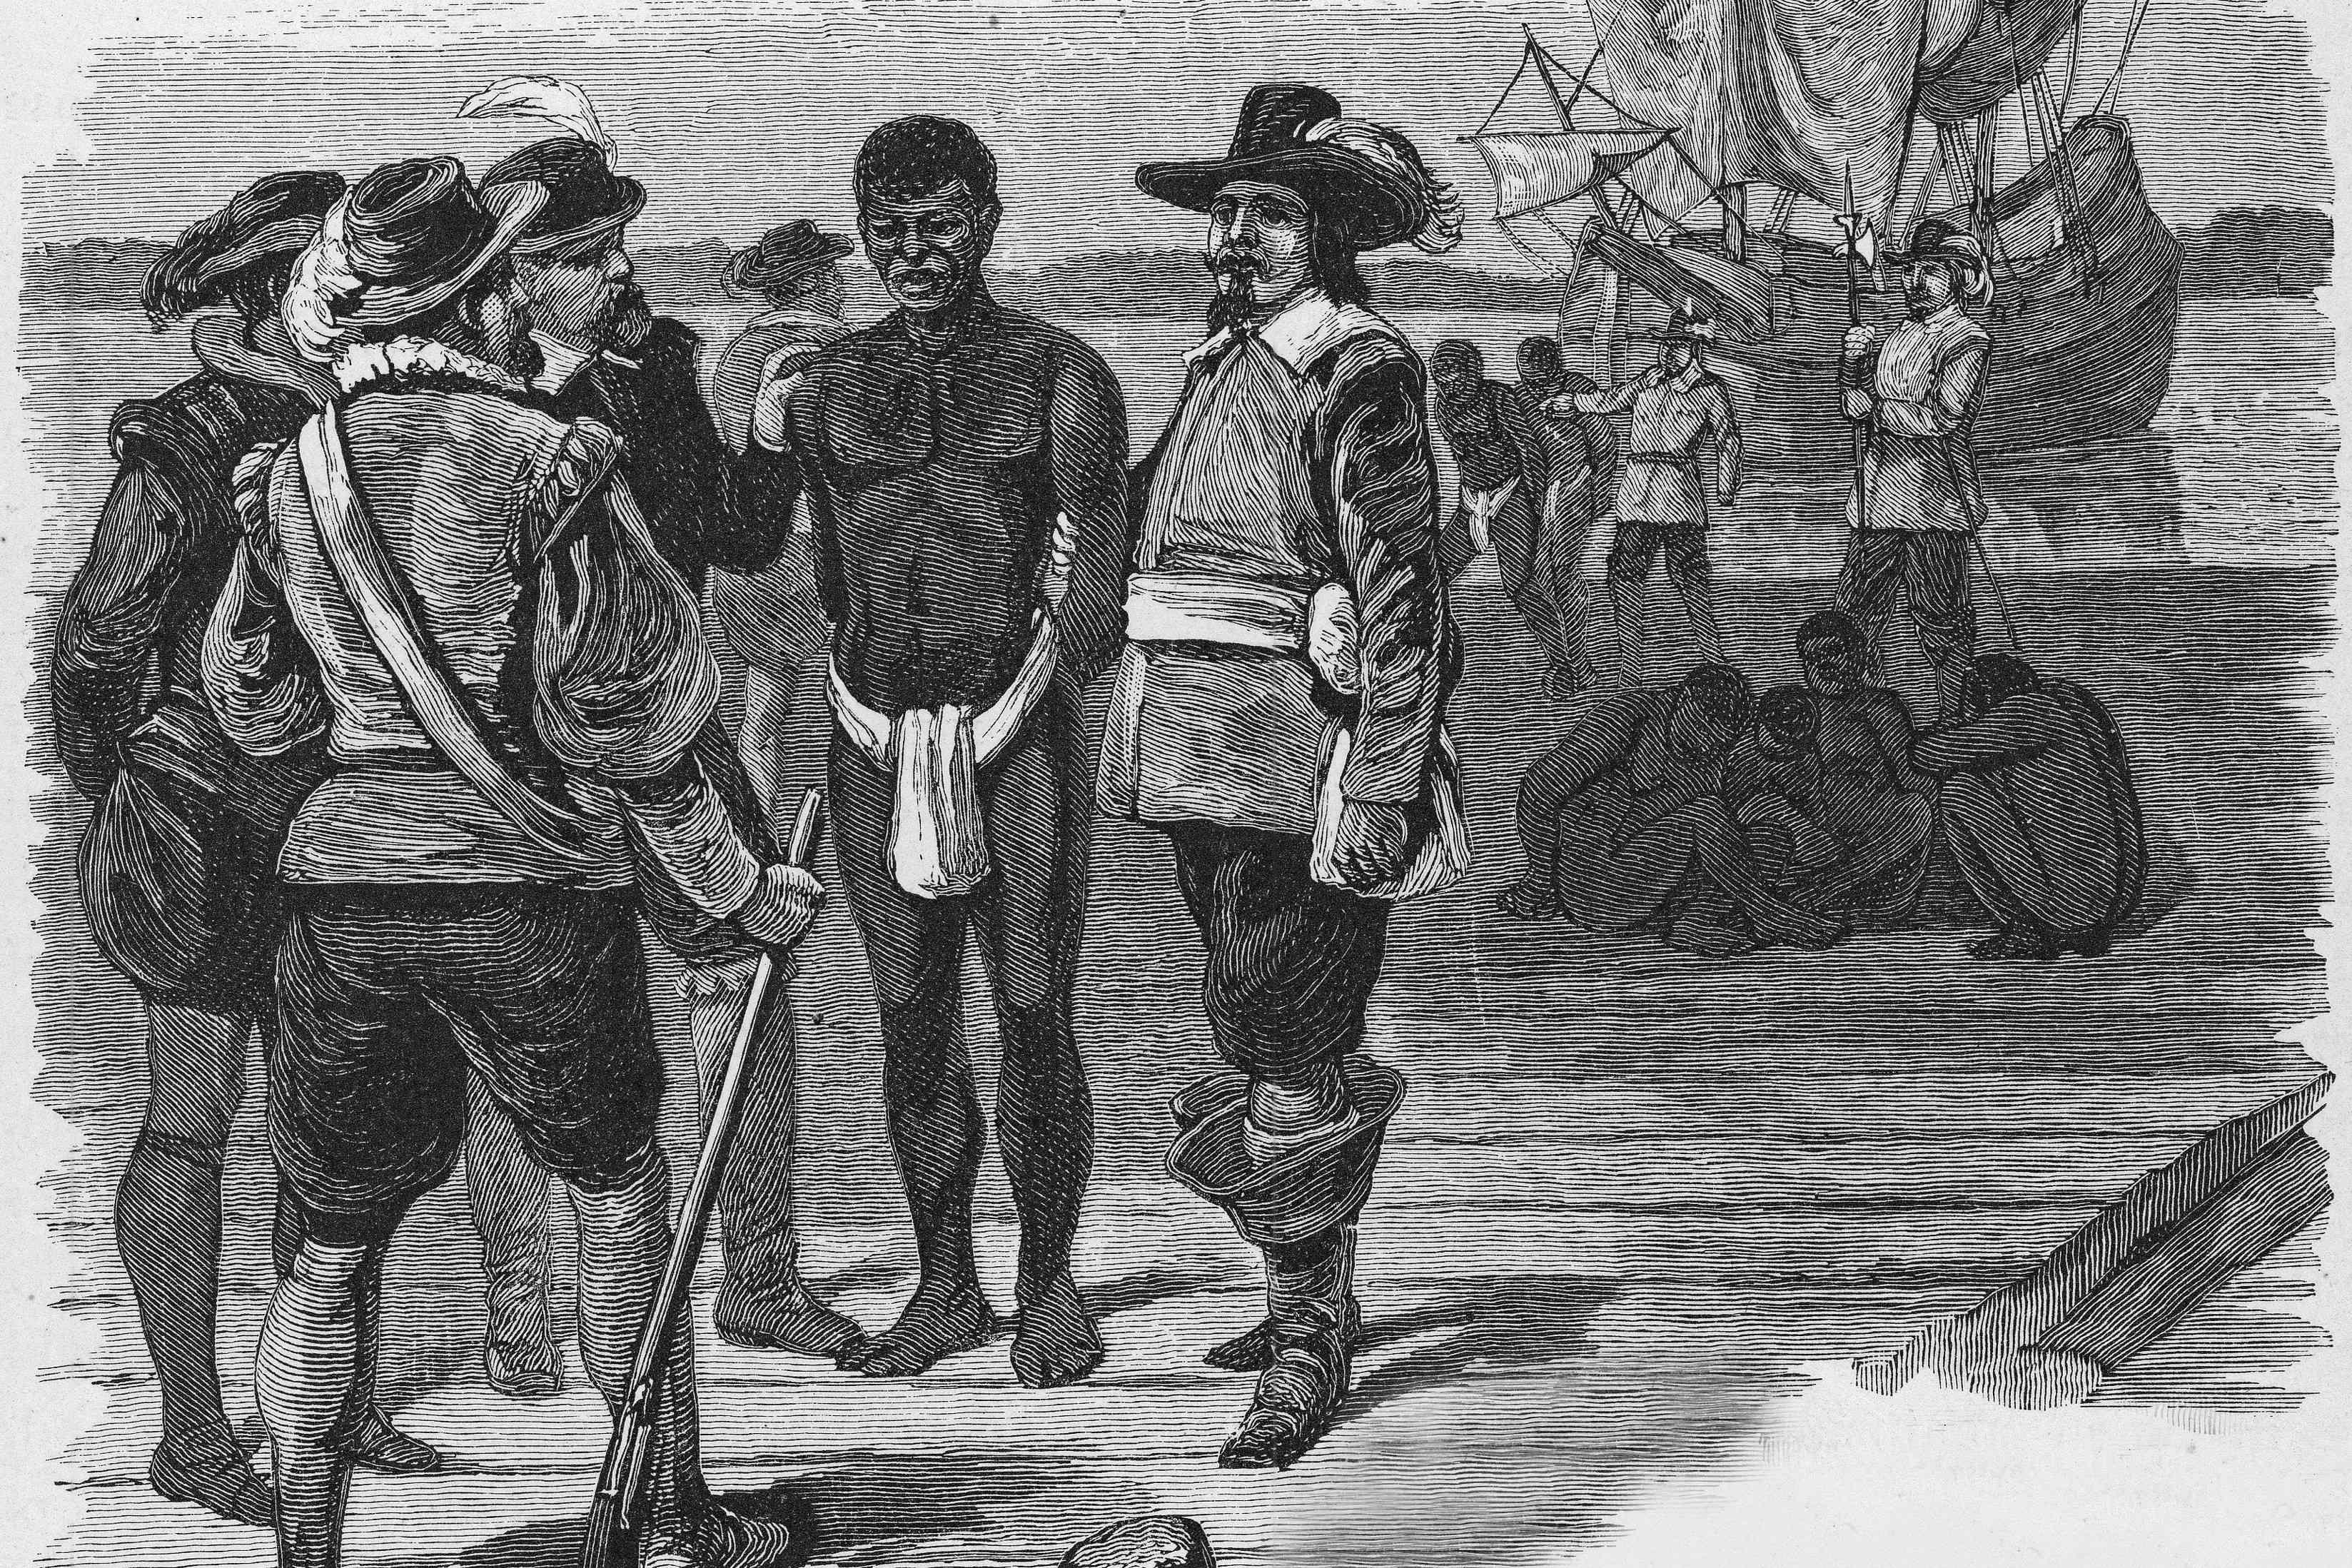 Enslaved people and enslavers standing together at a boat dock